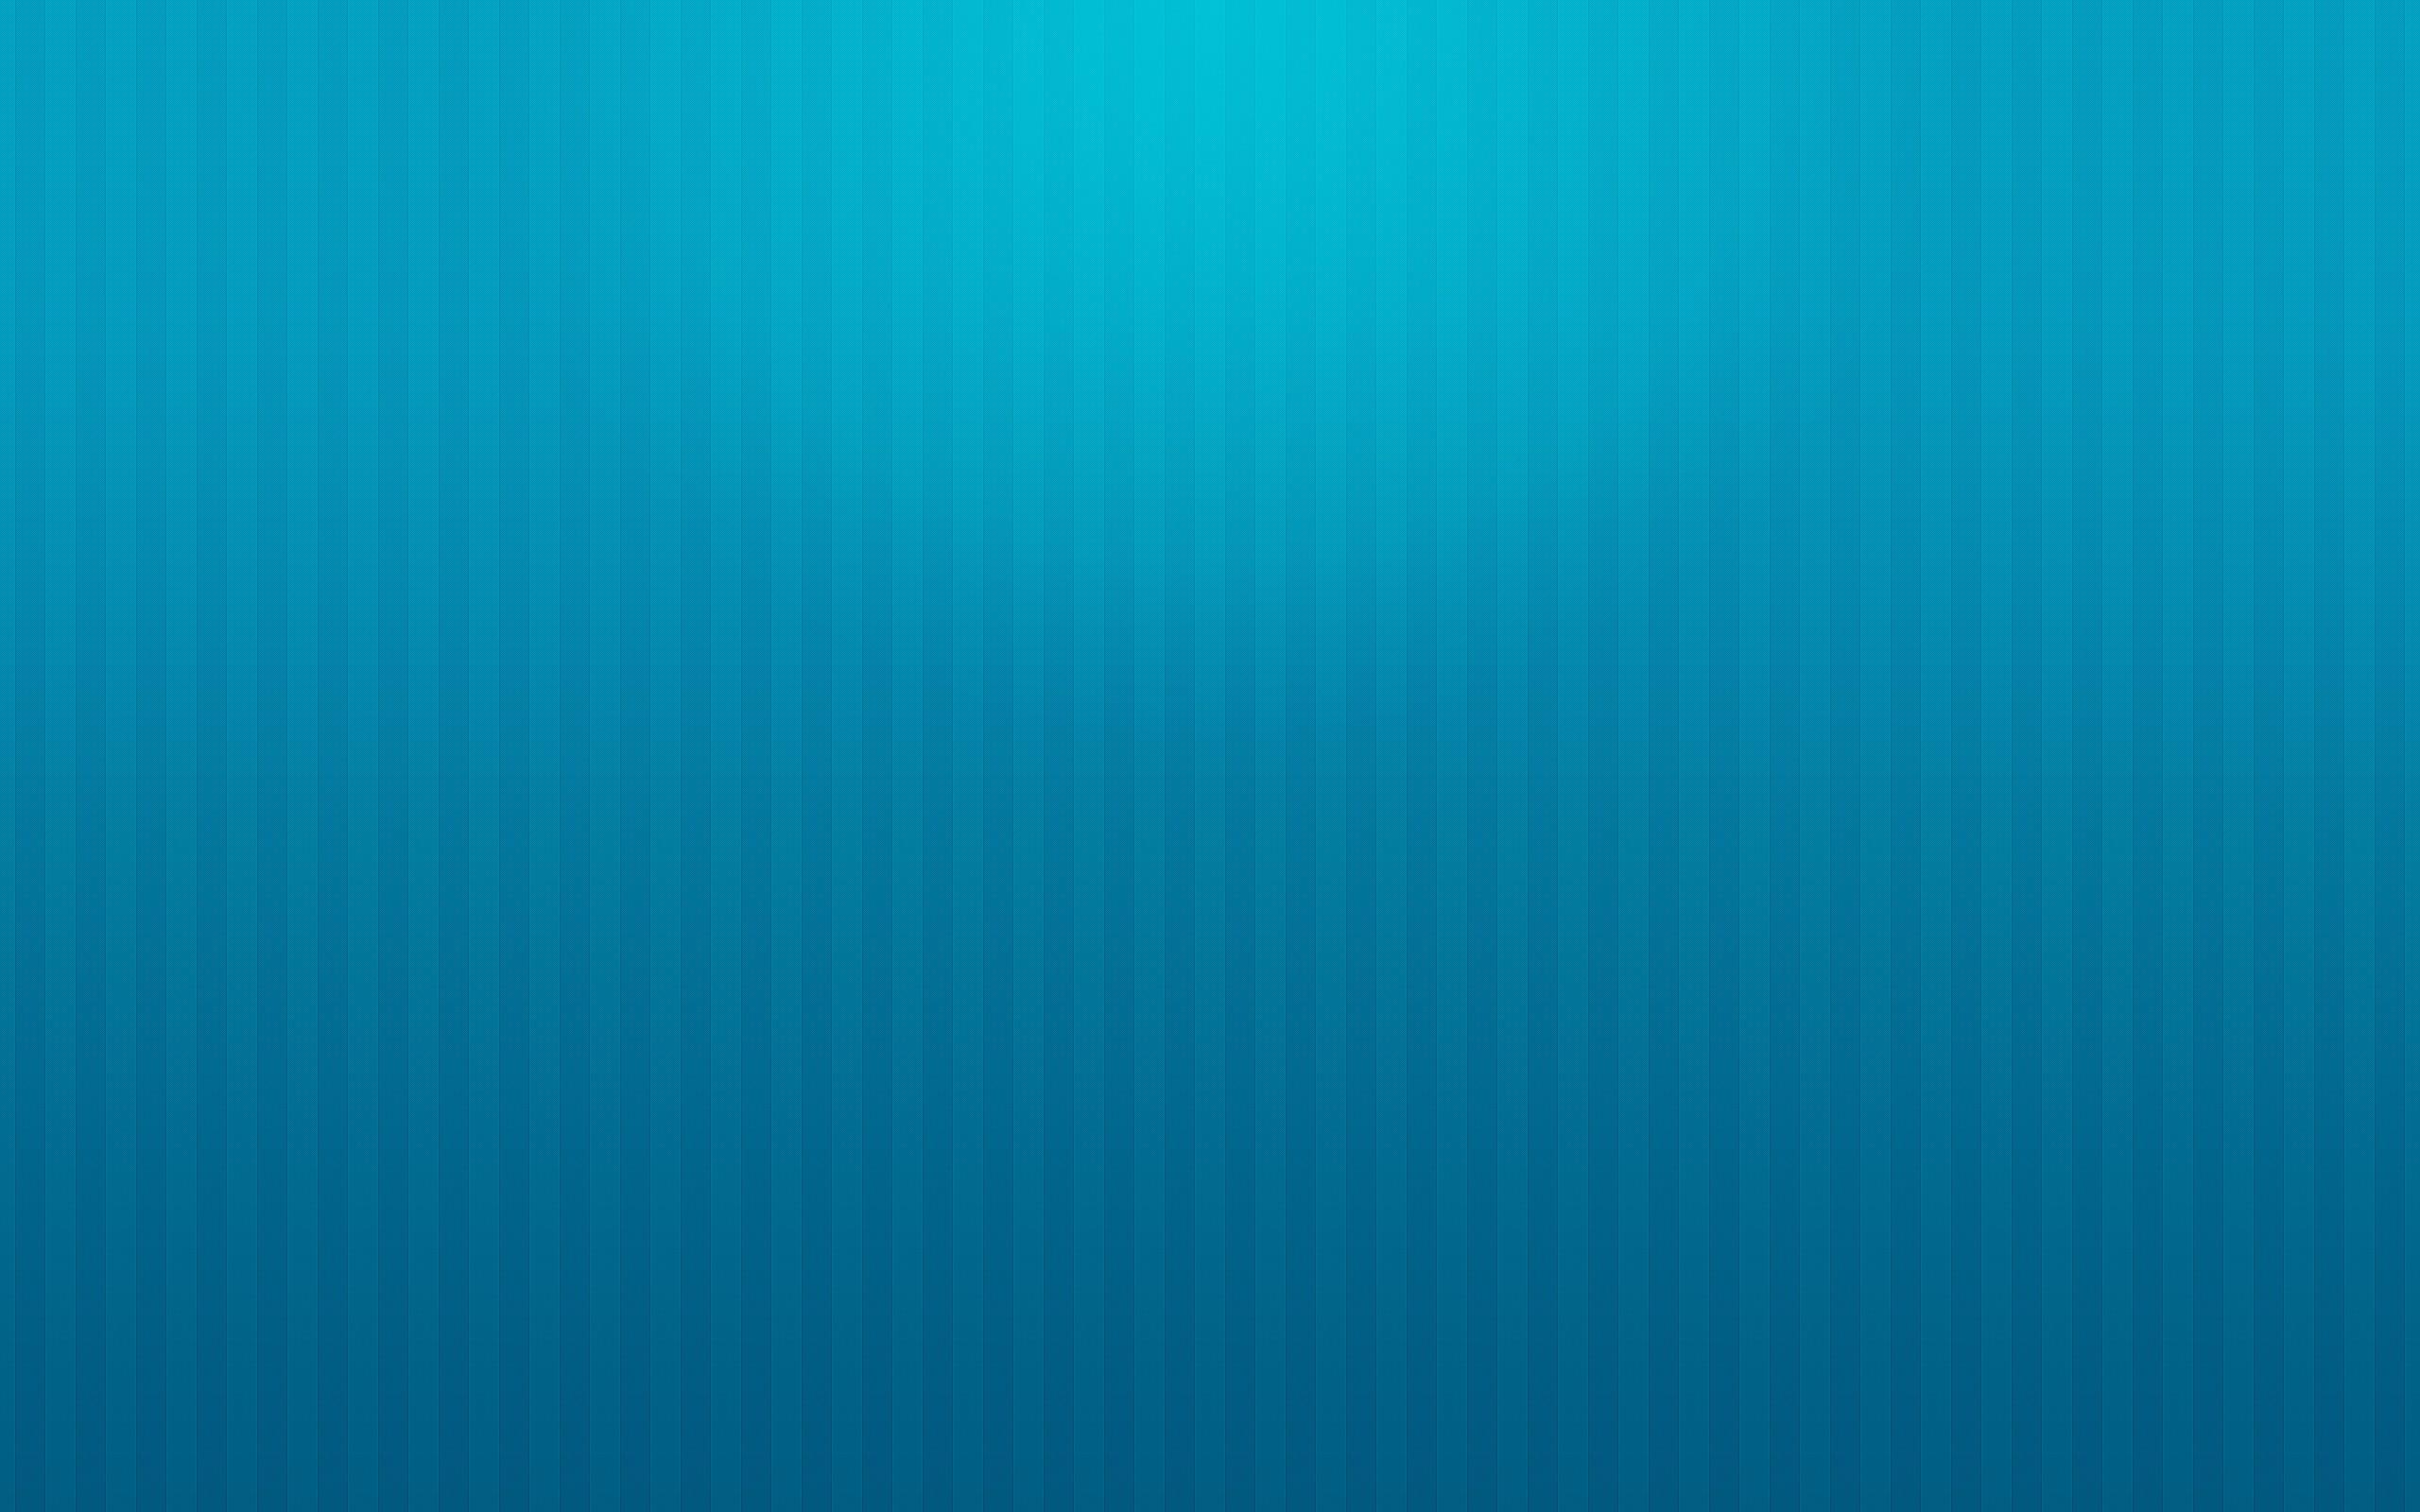 Light Blue Lining Plain Desktop Background Daily Pics Update HD 2560x1600